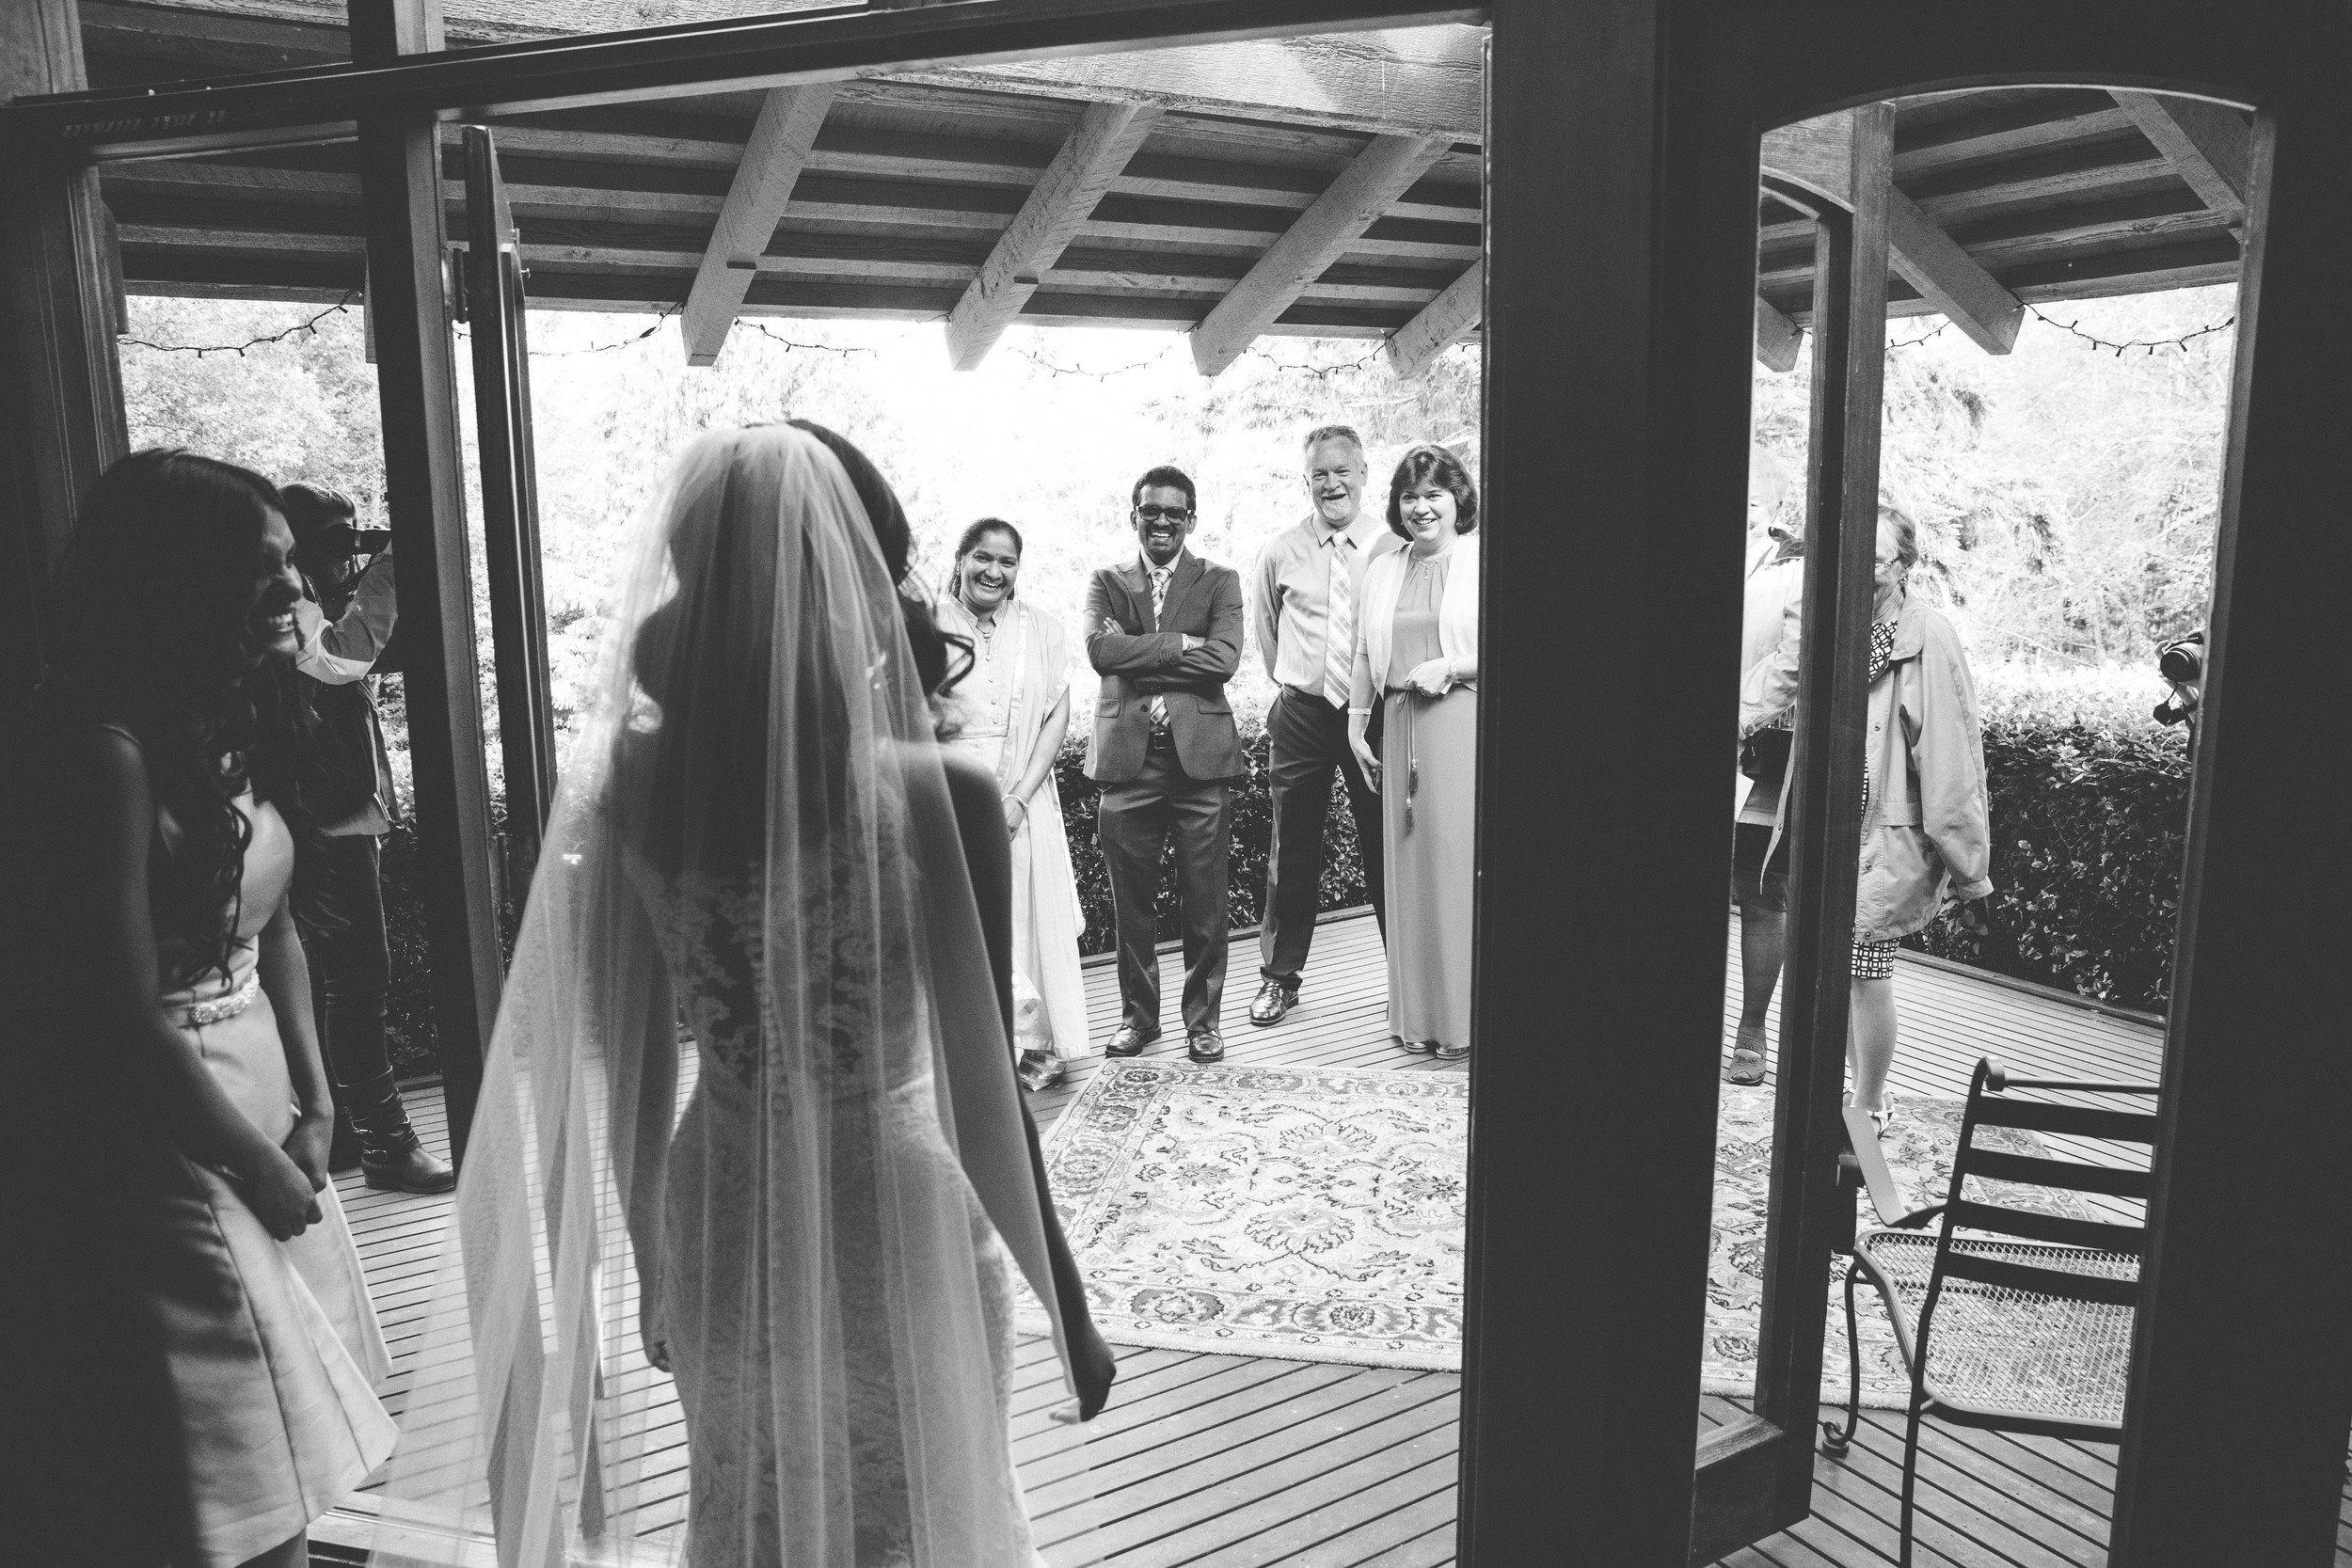 Hima+Dan_Wedding_Seattle+Couple_Kingston_6112016_2041.jpg